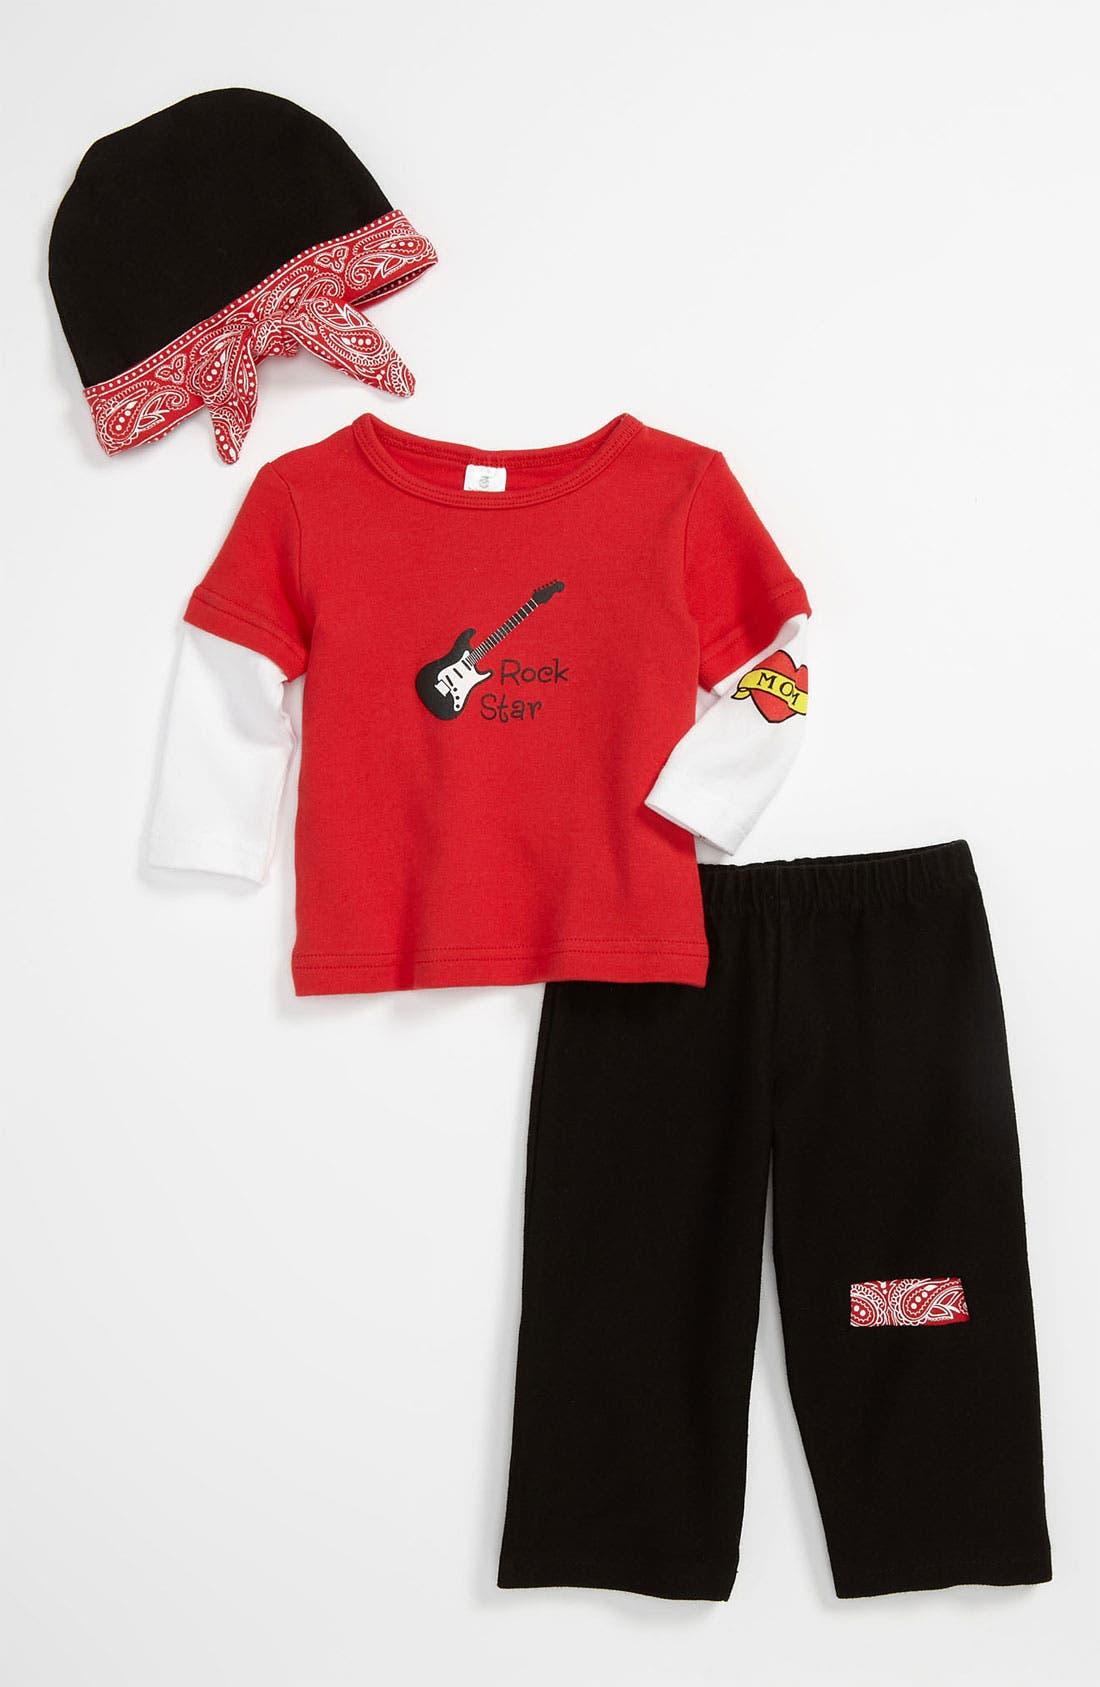 Alternate Image 1 Selected - Baby Aspen 'Baby Rockstar' Shirt, Pants & Hat (Baby)